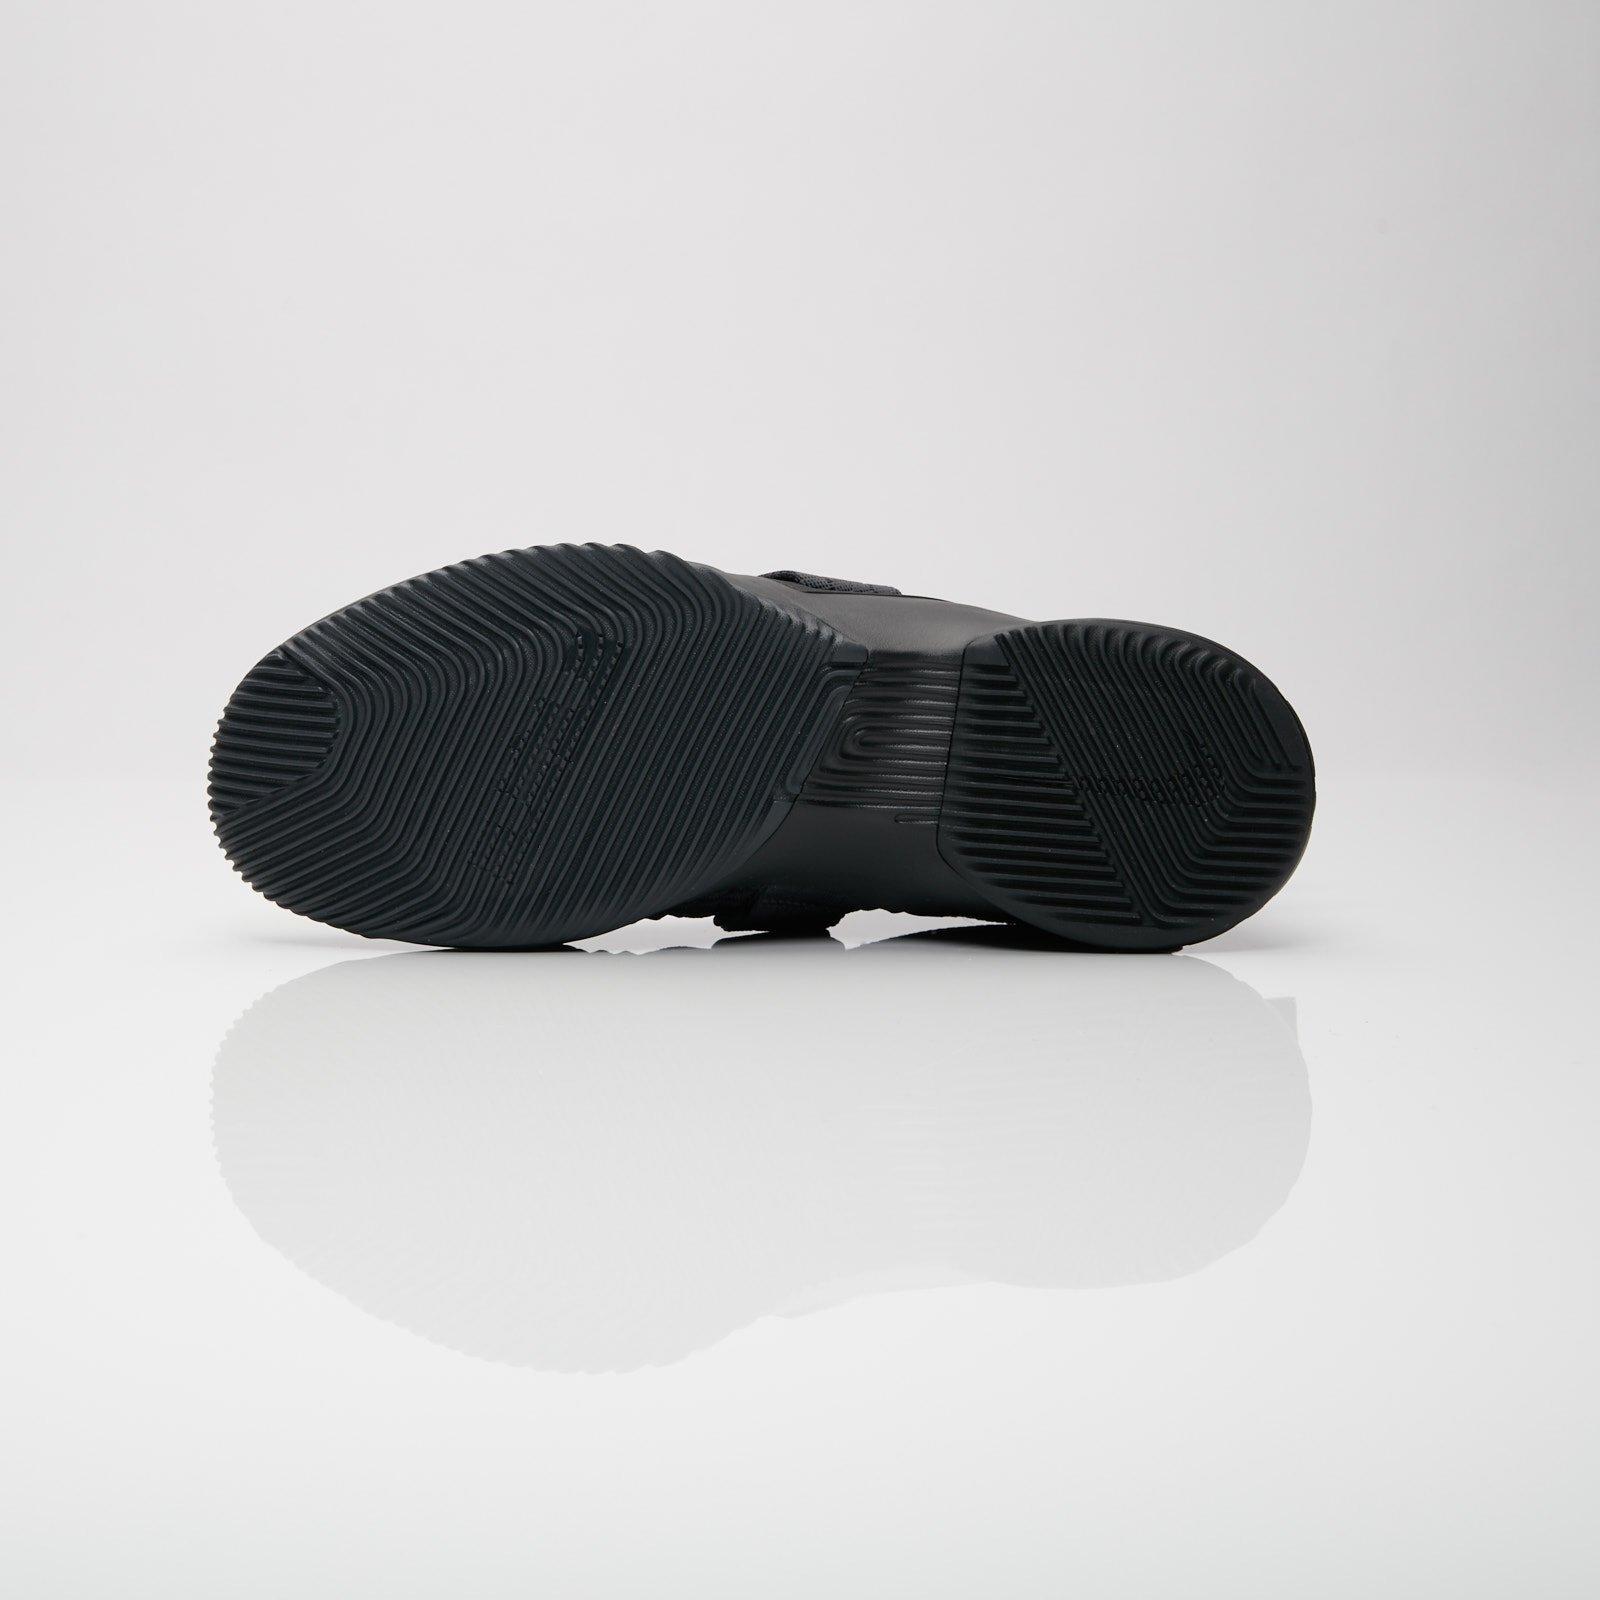 Nike Lebron Soldier XII SFG - Ao4054-002 - Sneakersnstuff  33e7d5eea